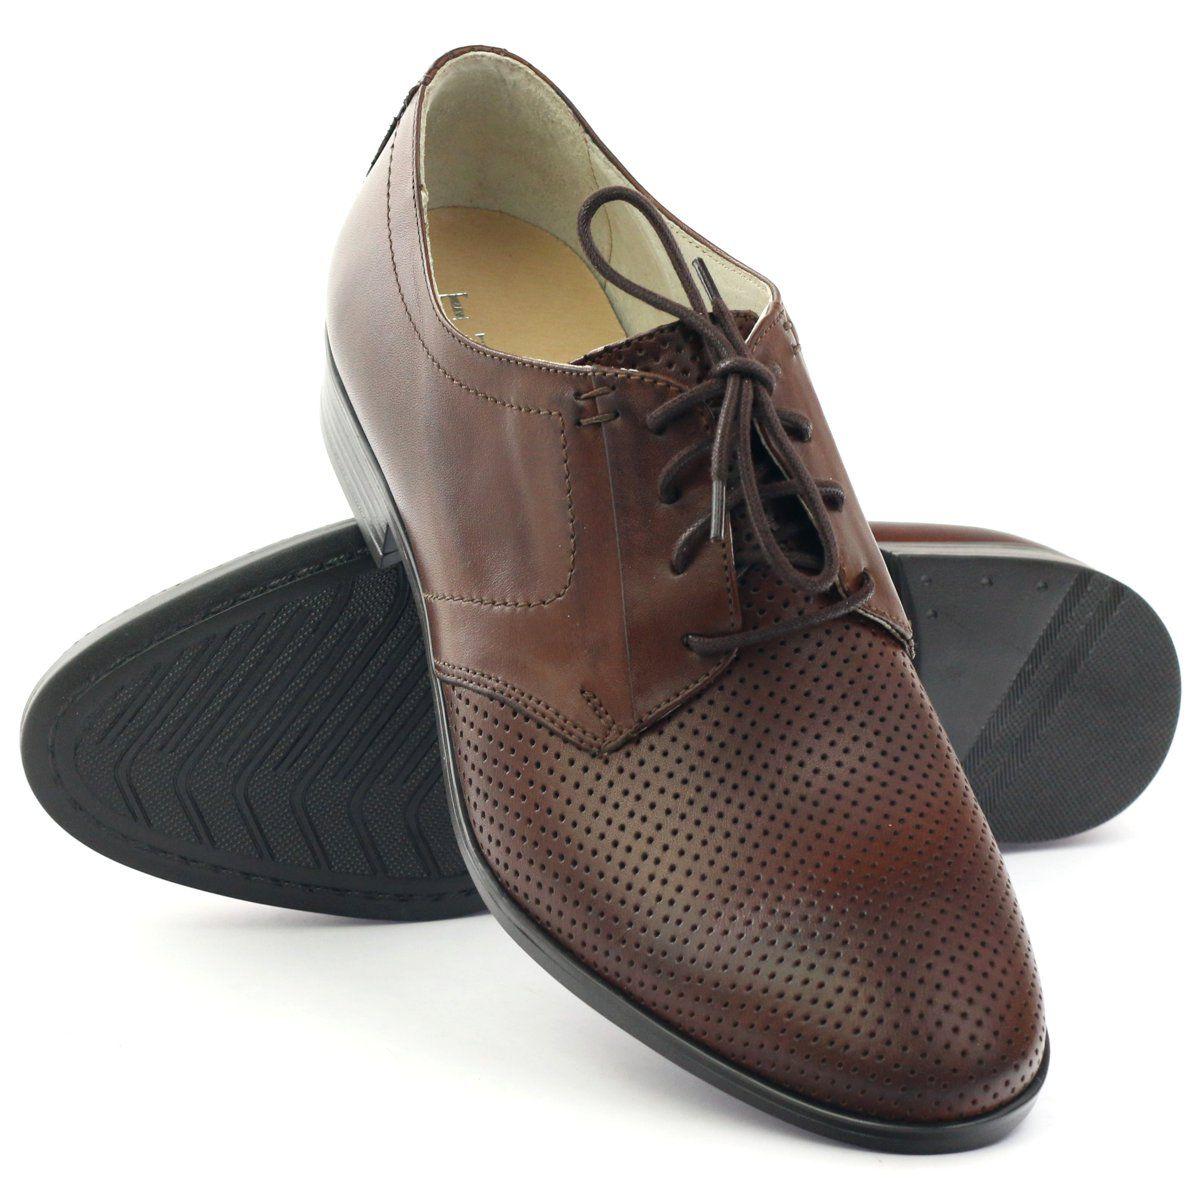 Polbuty Meskie Tur 344 Brazowe Shoes Dance Shoes Tap Shoes